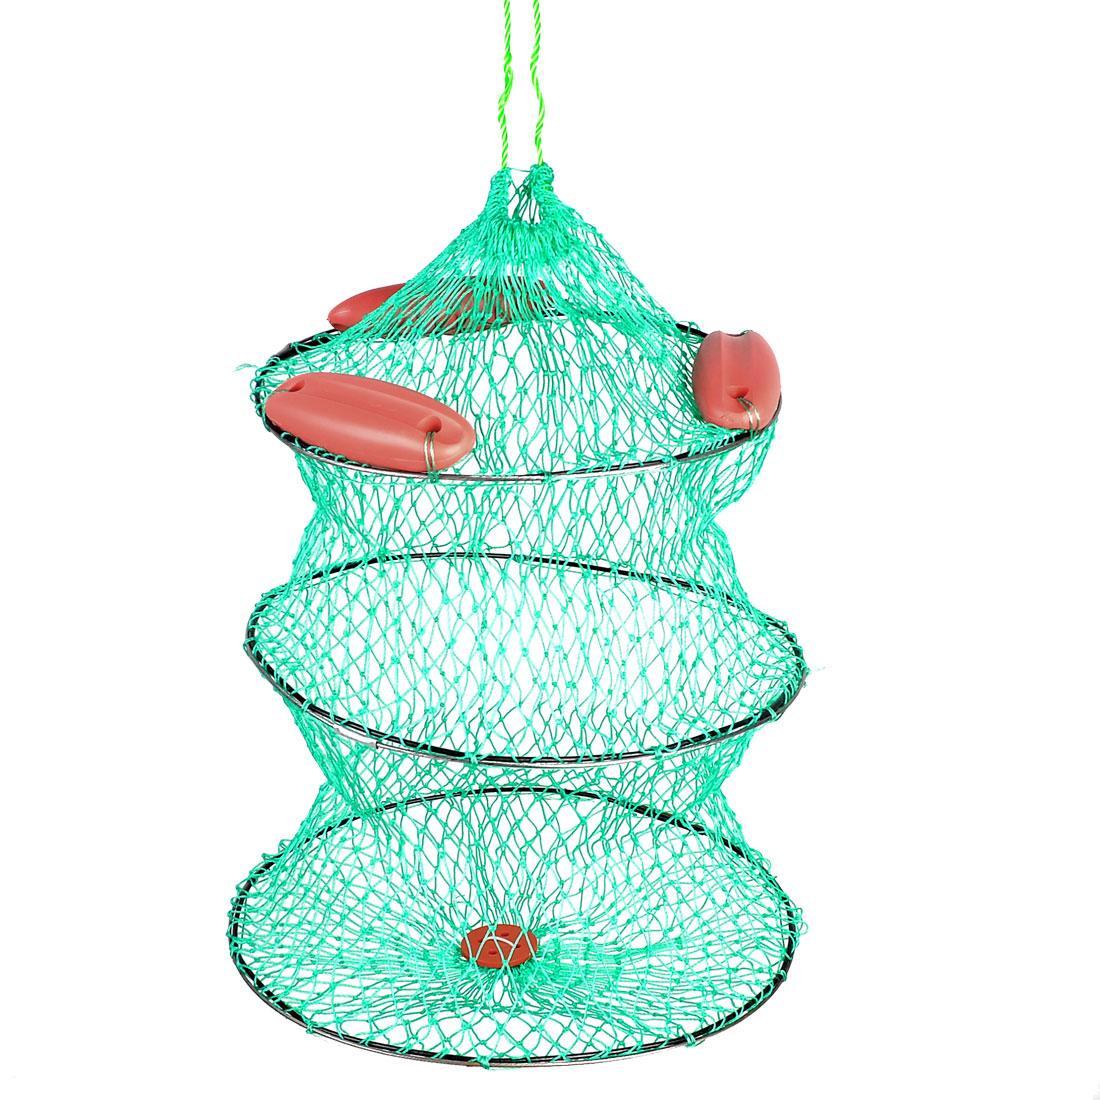 34cm Dai Green Drawstring Closure Shrimp Crab 2 Layers Fishing Net